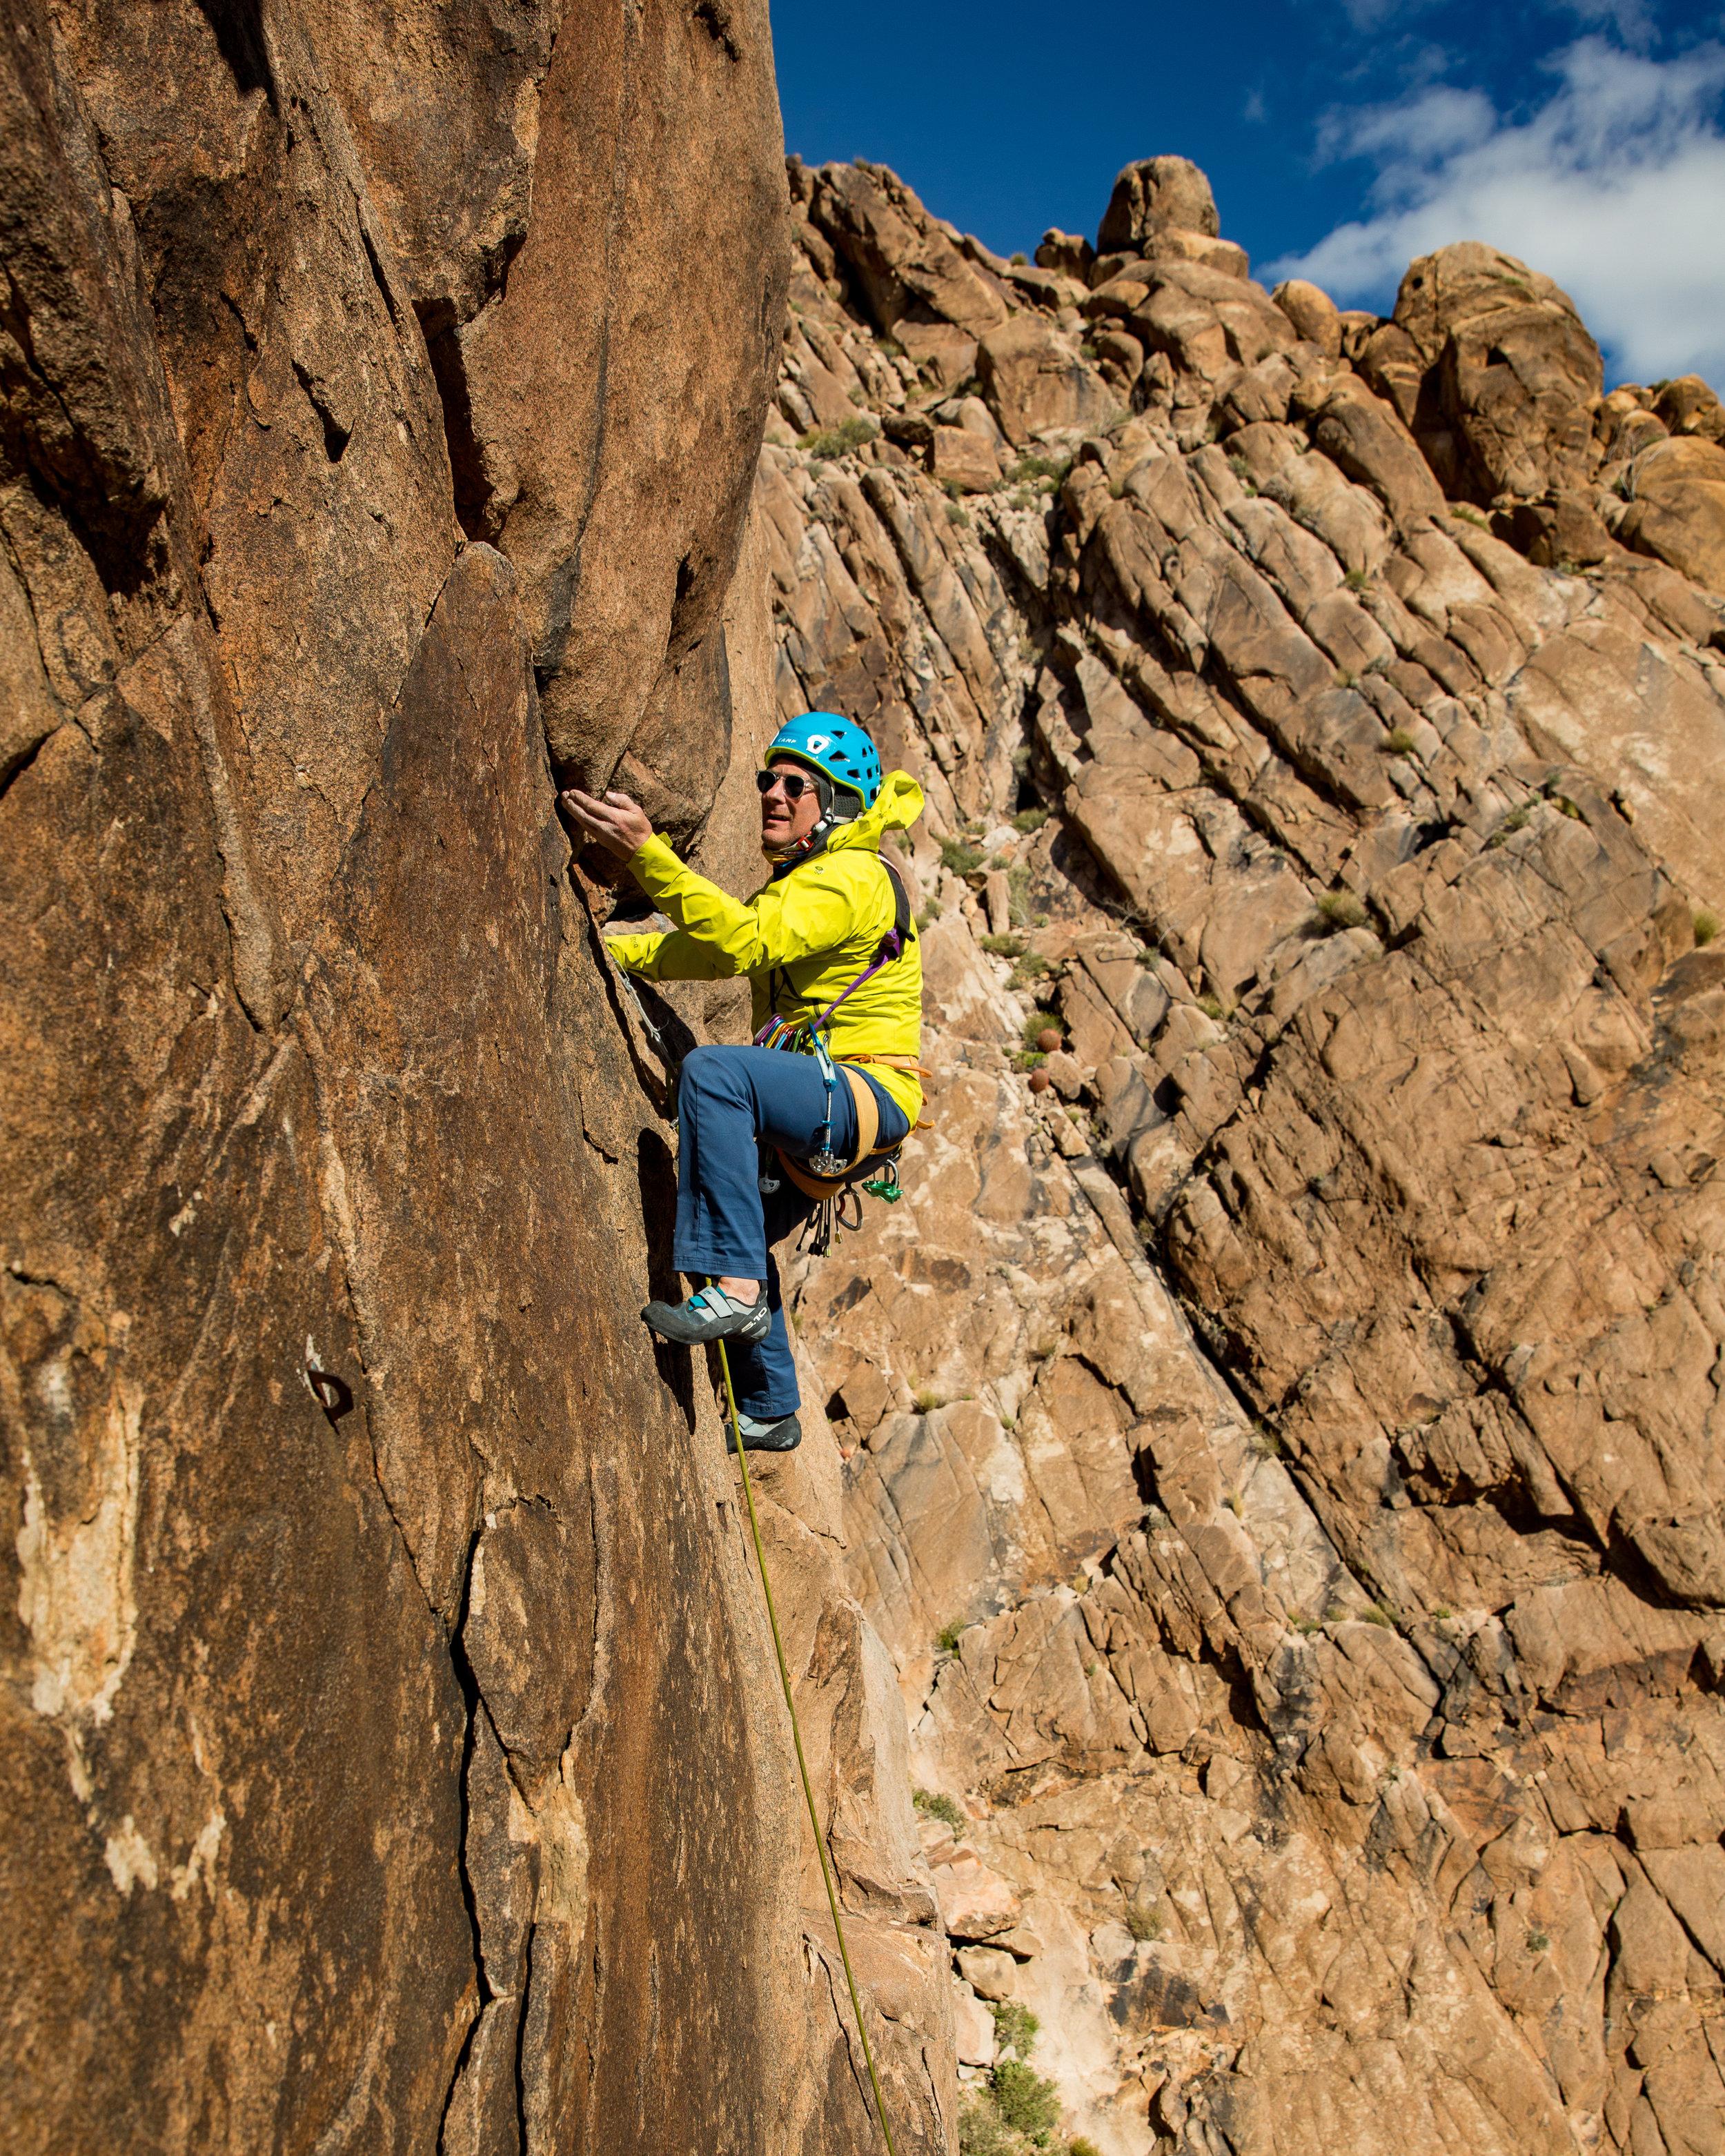 Powers climbs in Red Rocks. Photo: Irene Yee.